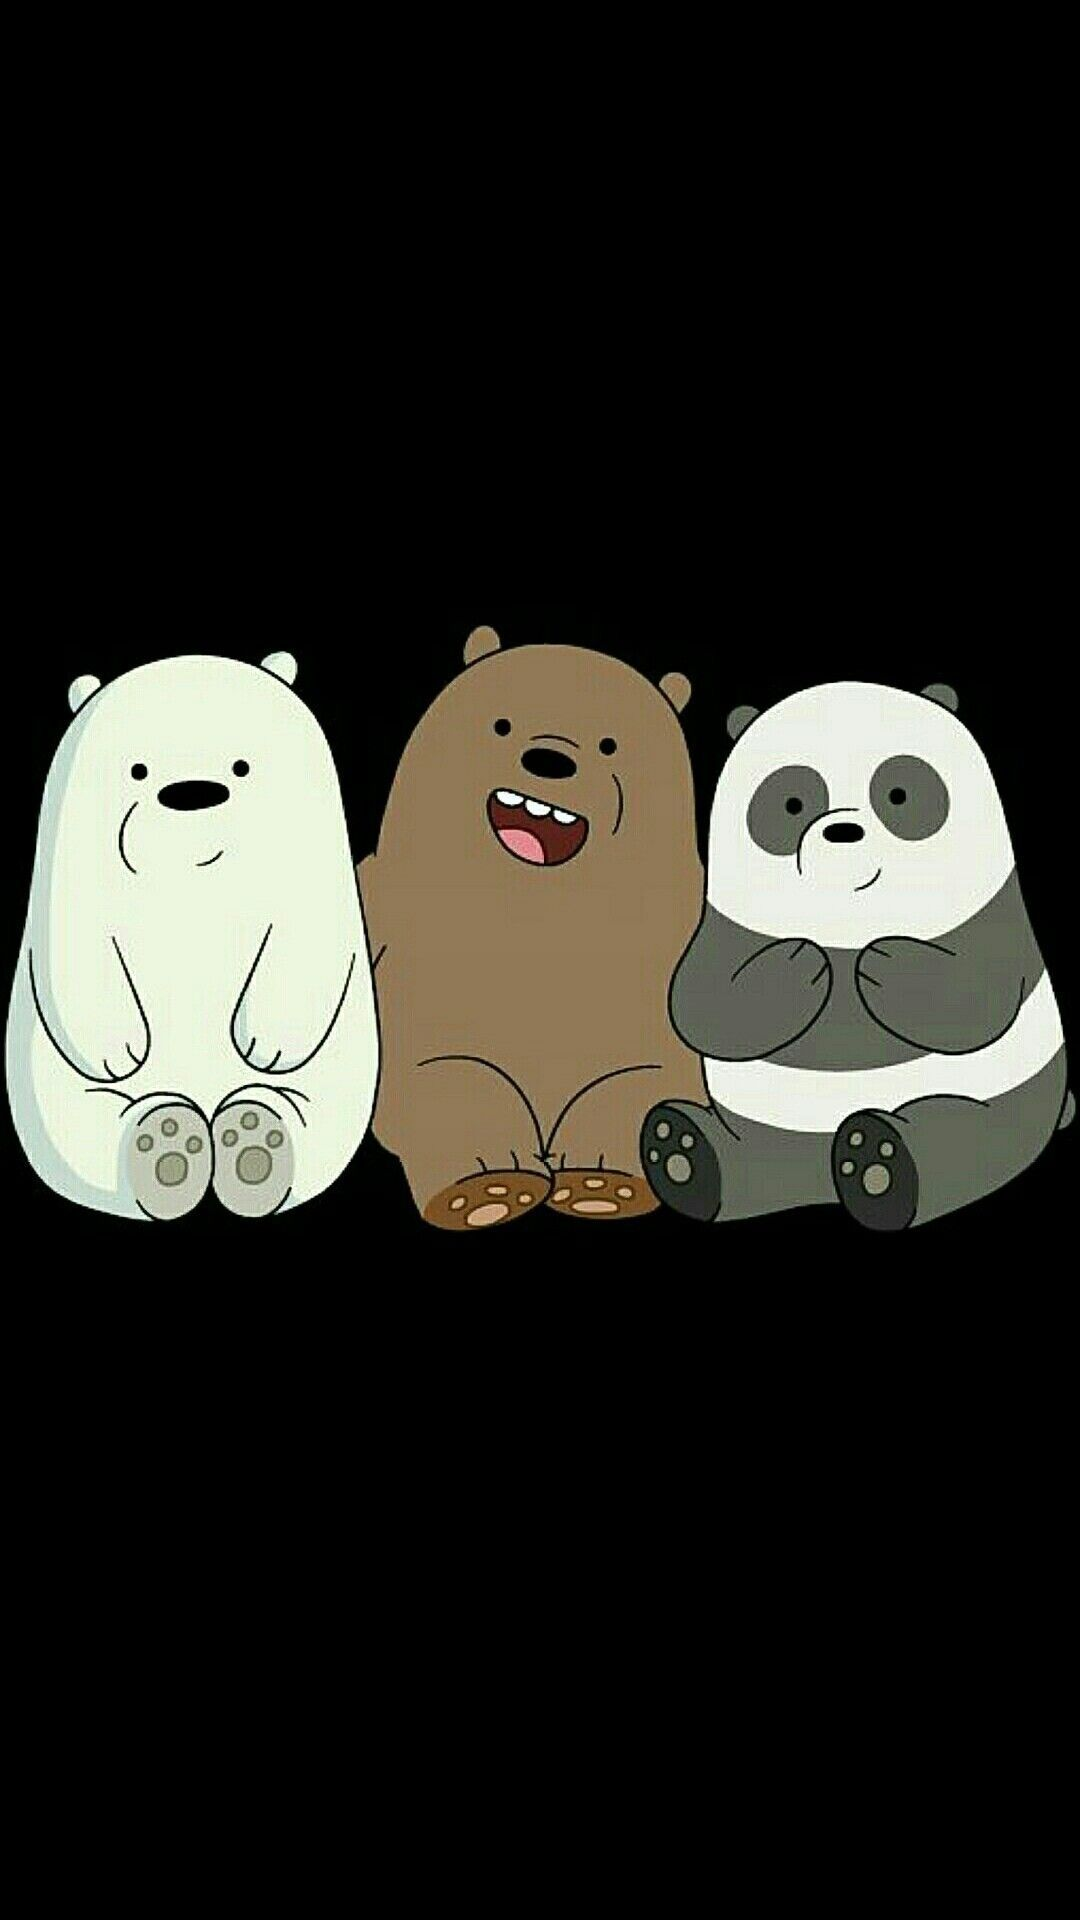 We Bare Bears Wallpaper Iphone Group 30 Download For Regarding Amazing We Bare Bears Fondo De Pantalla Oso Fondos De Pantalla Panda Fondos De Pantalla Animales